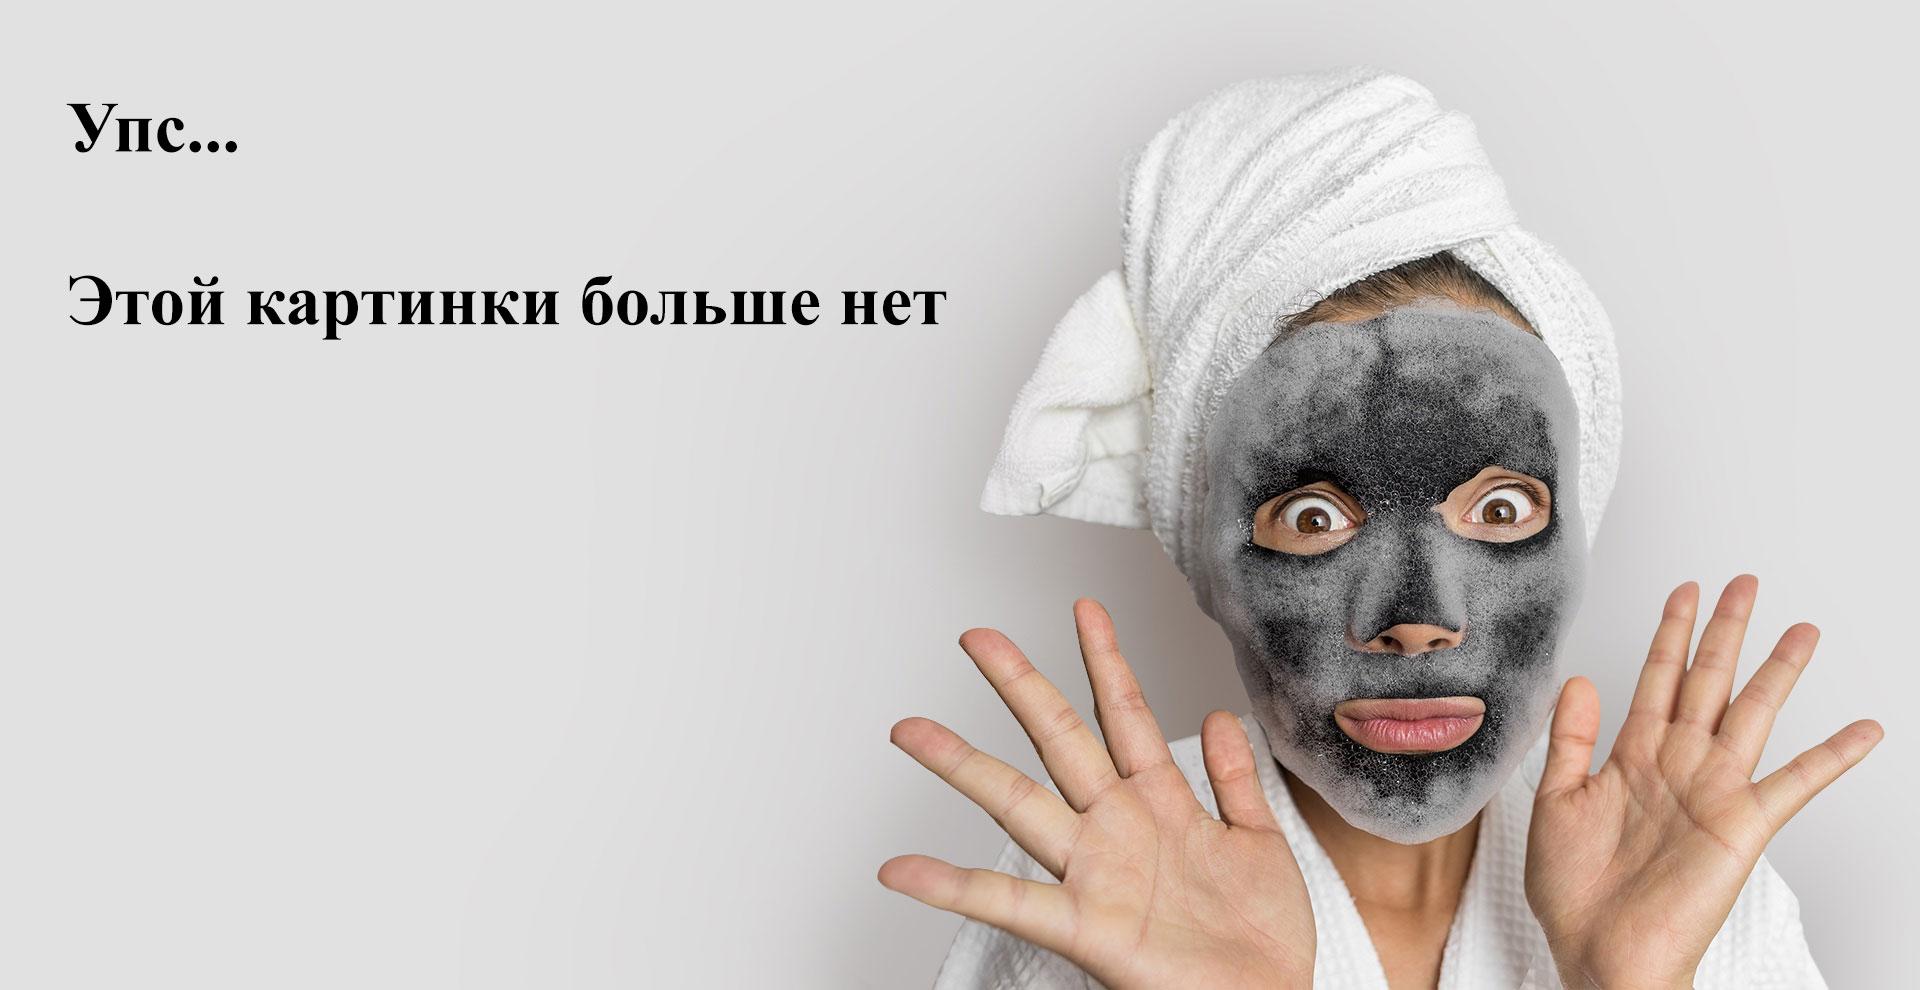 It's Skin, Сыворотка для ресниц Babyface, восстанавливающая